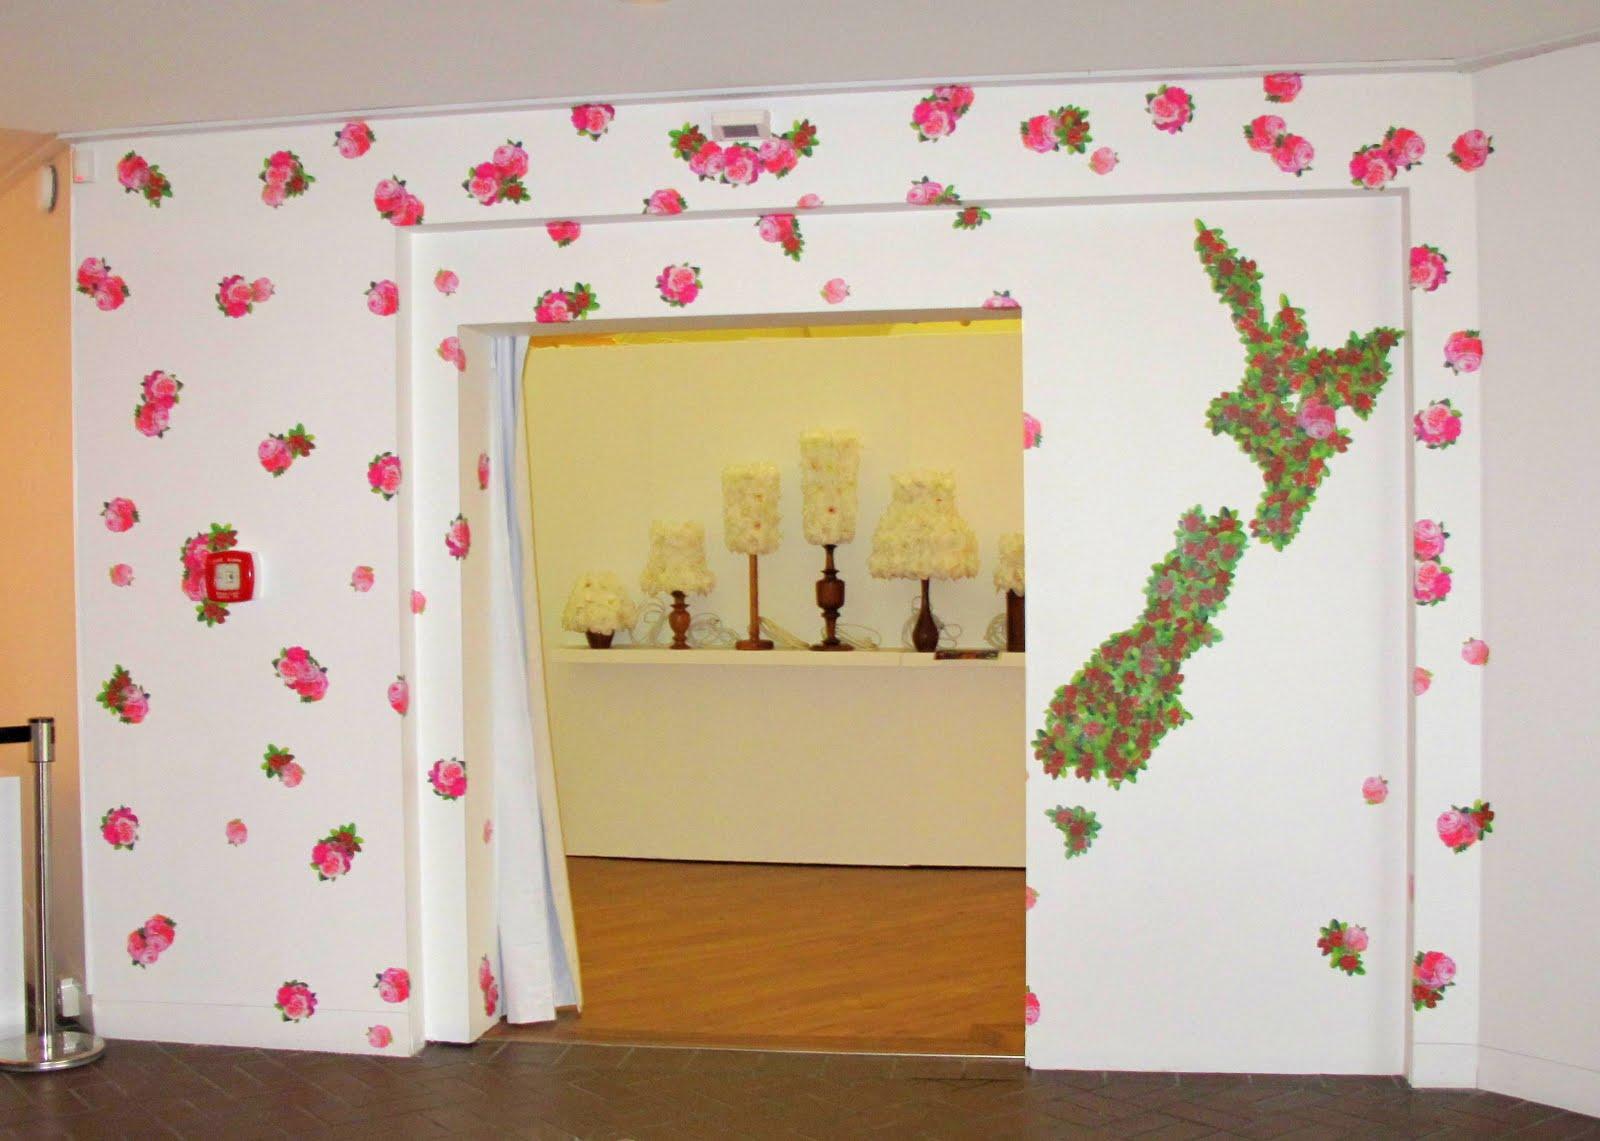 Puti Puti: The Flower in Contemporary New Zealand Art - StickyTiki